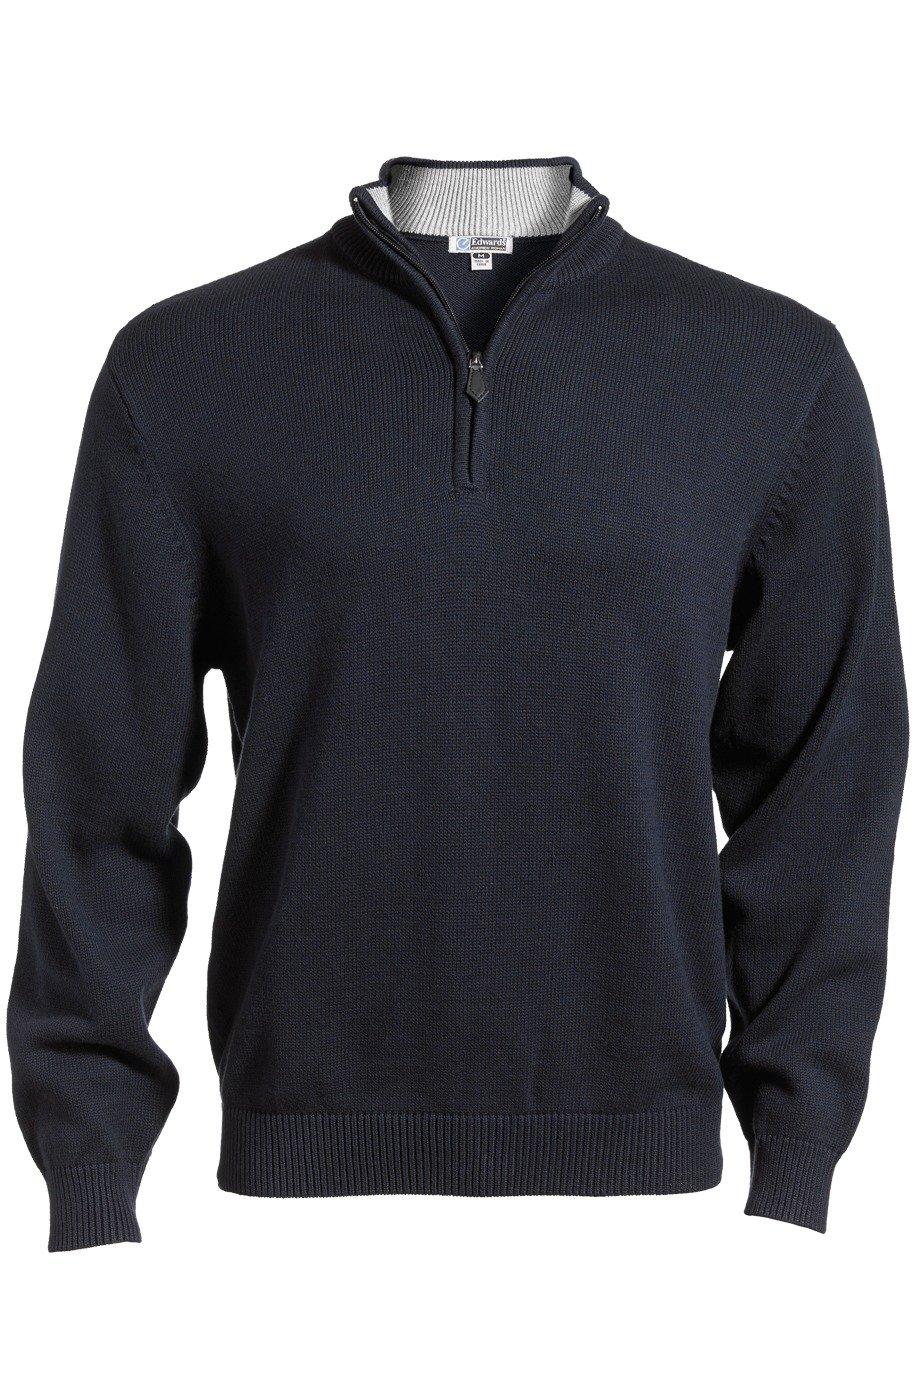 Edwards Garment Men's Quarter-Zip Cotton Blend Sweater, Navy, Large